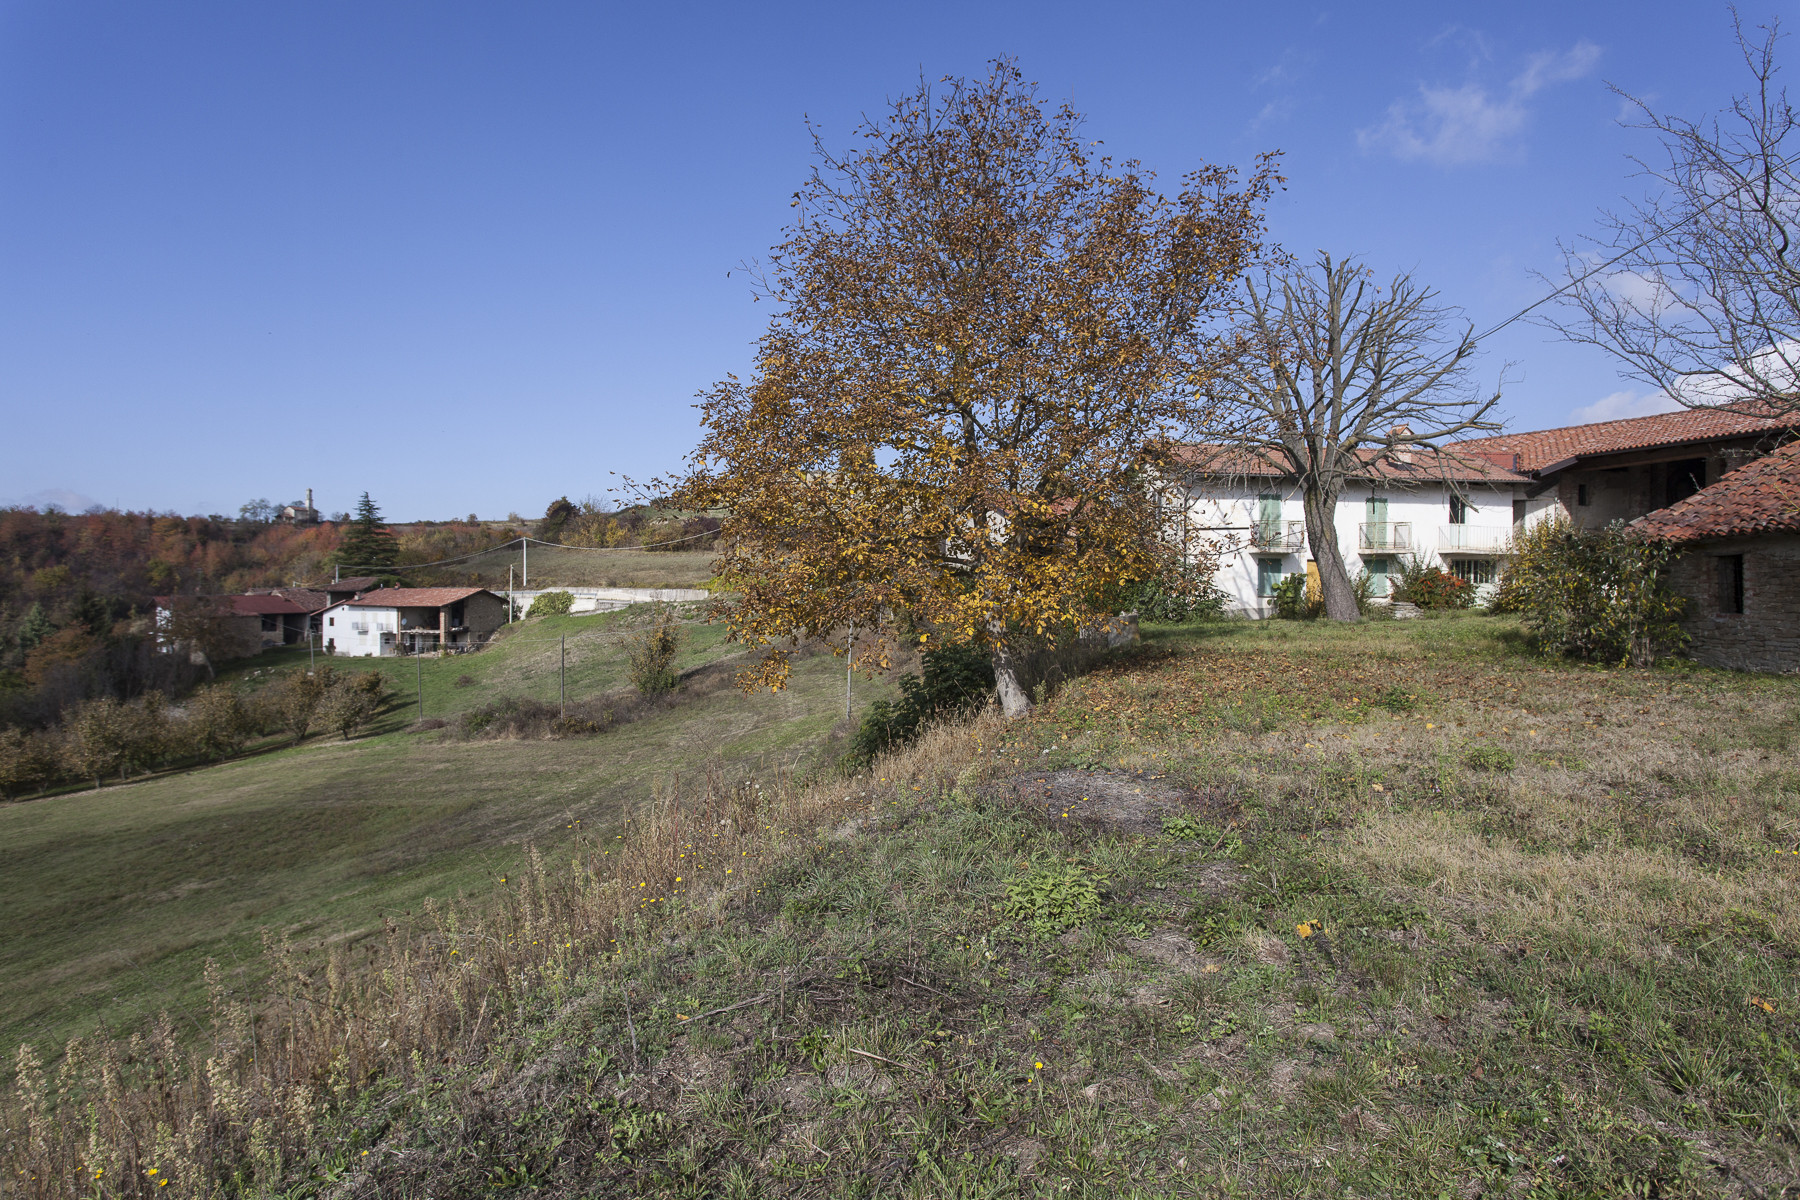 Villa in Vendita a Clavesana: 5 locali, 1130 mq - Foto 11